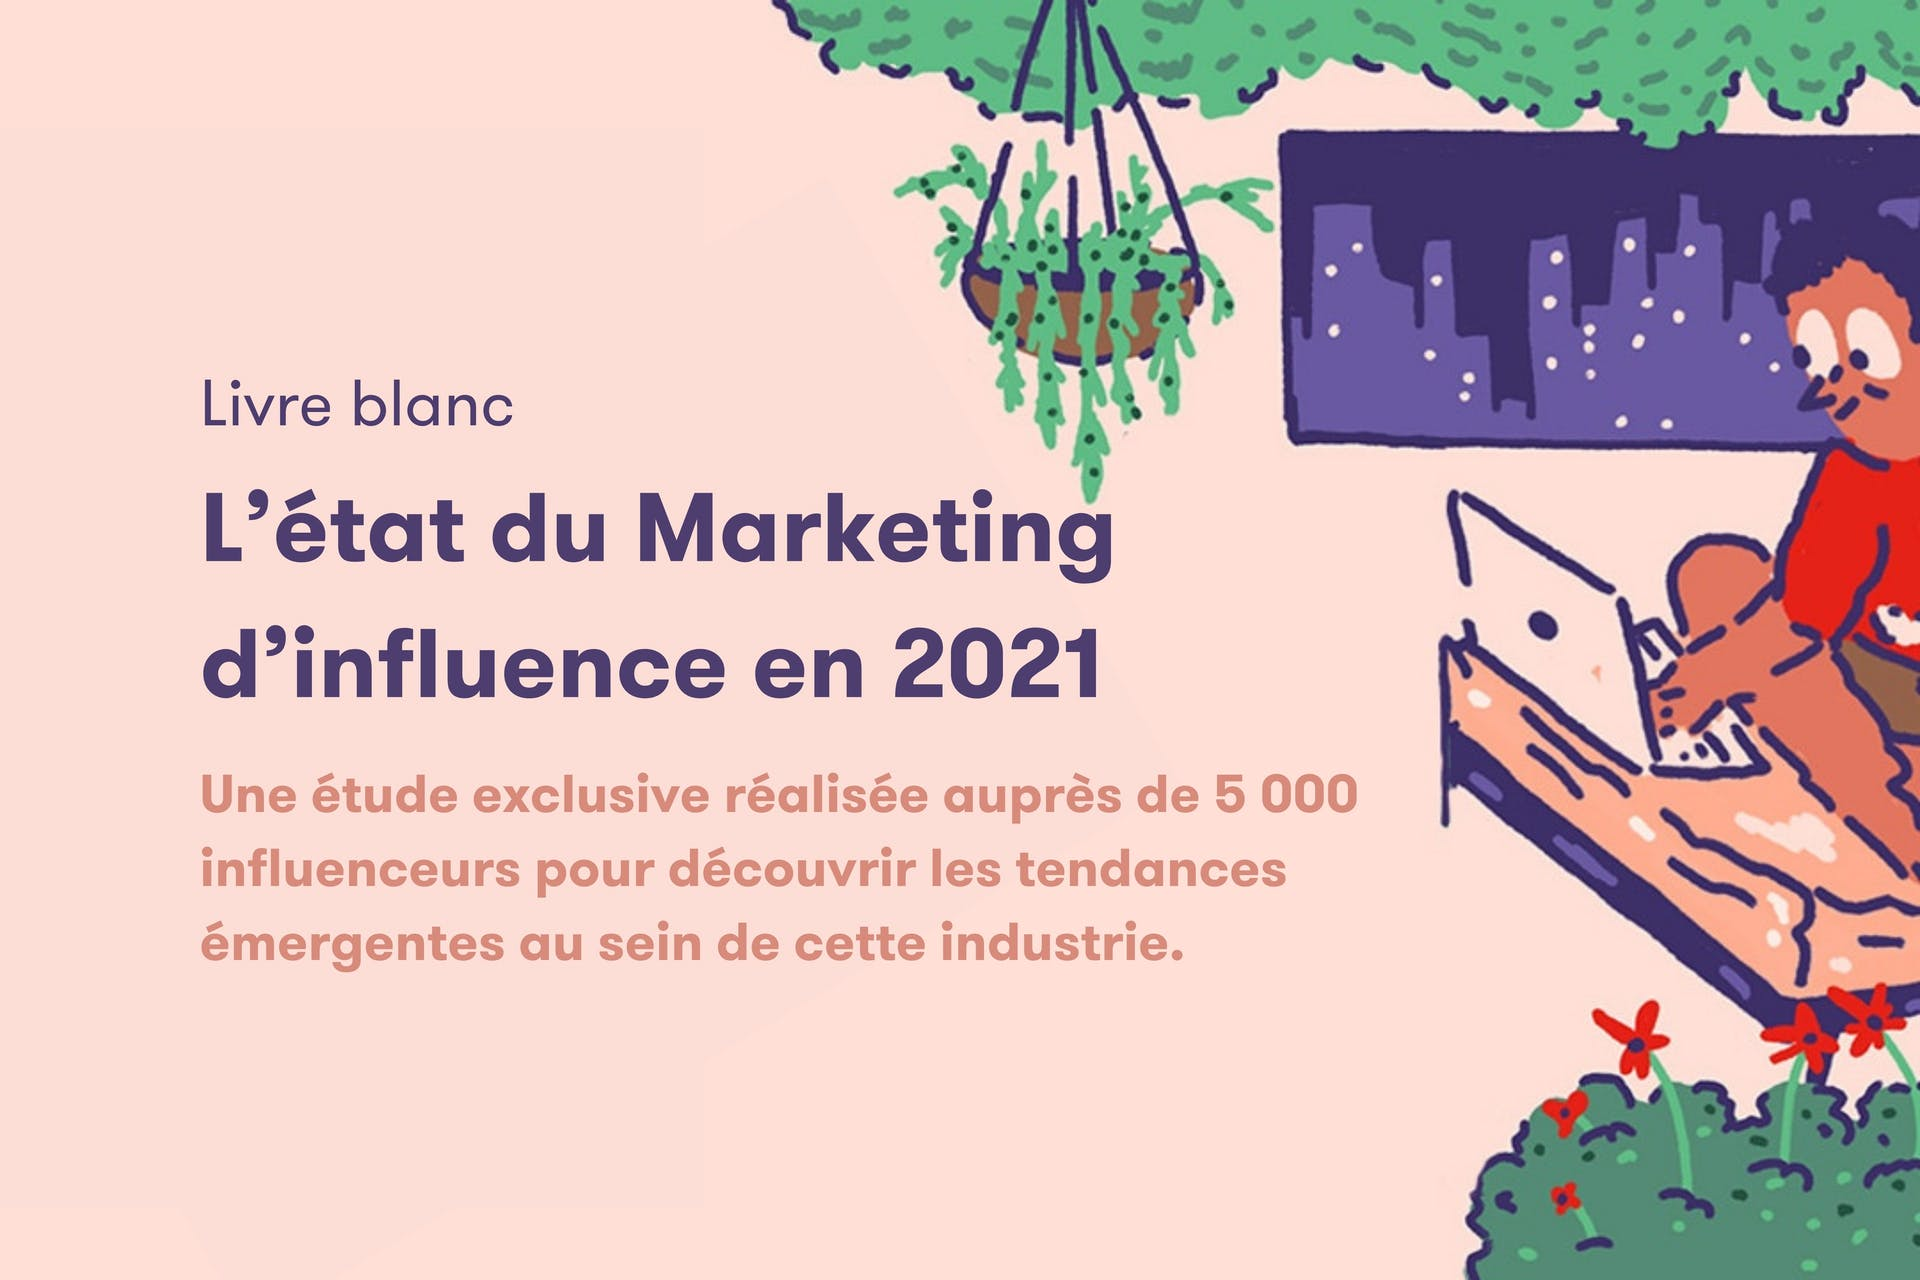 L'état du marketing d'influence en 2021